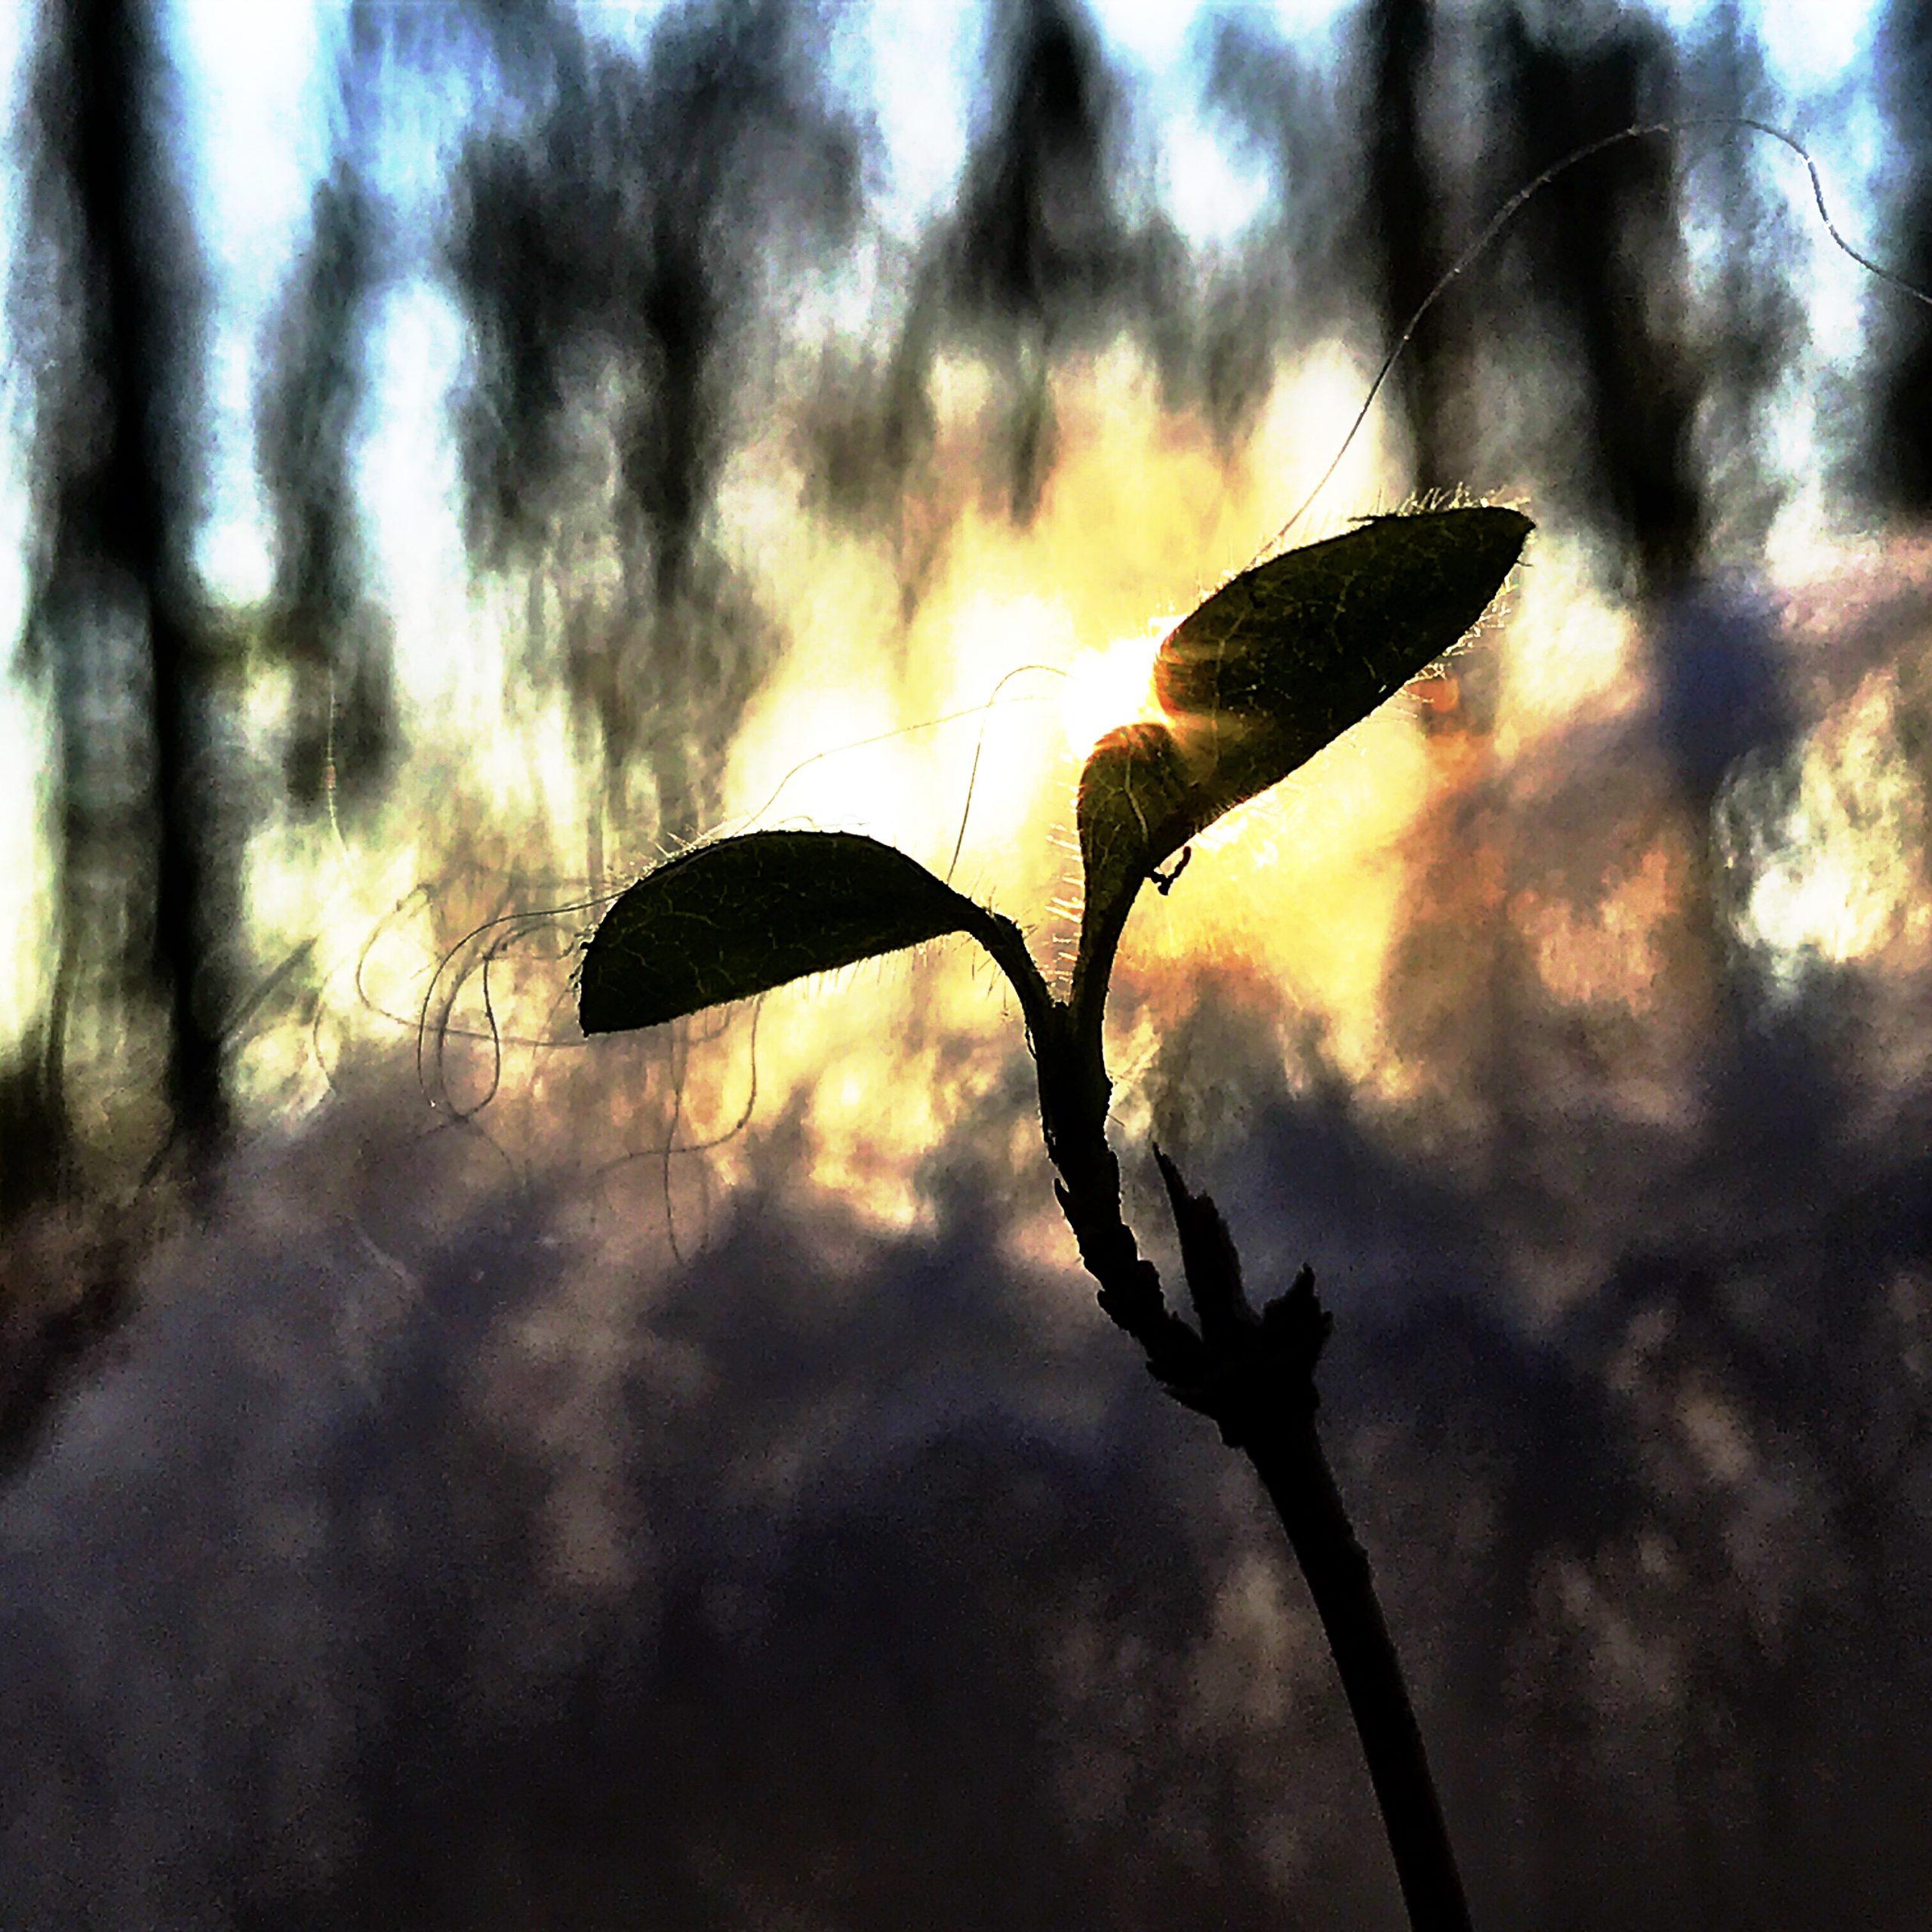 Handy-Makro: Baumschössling vor Sonnenuntergang